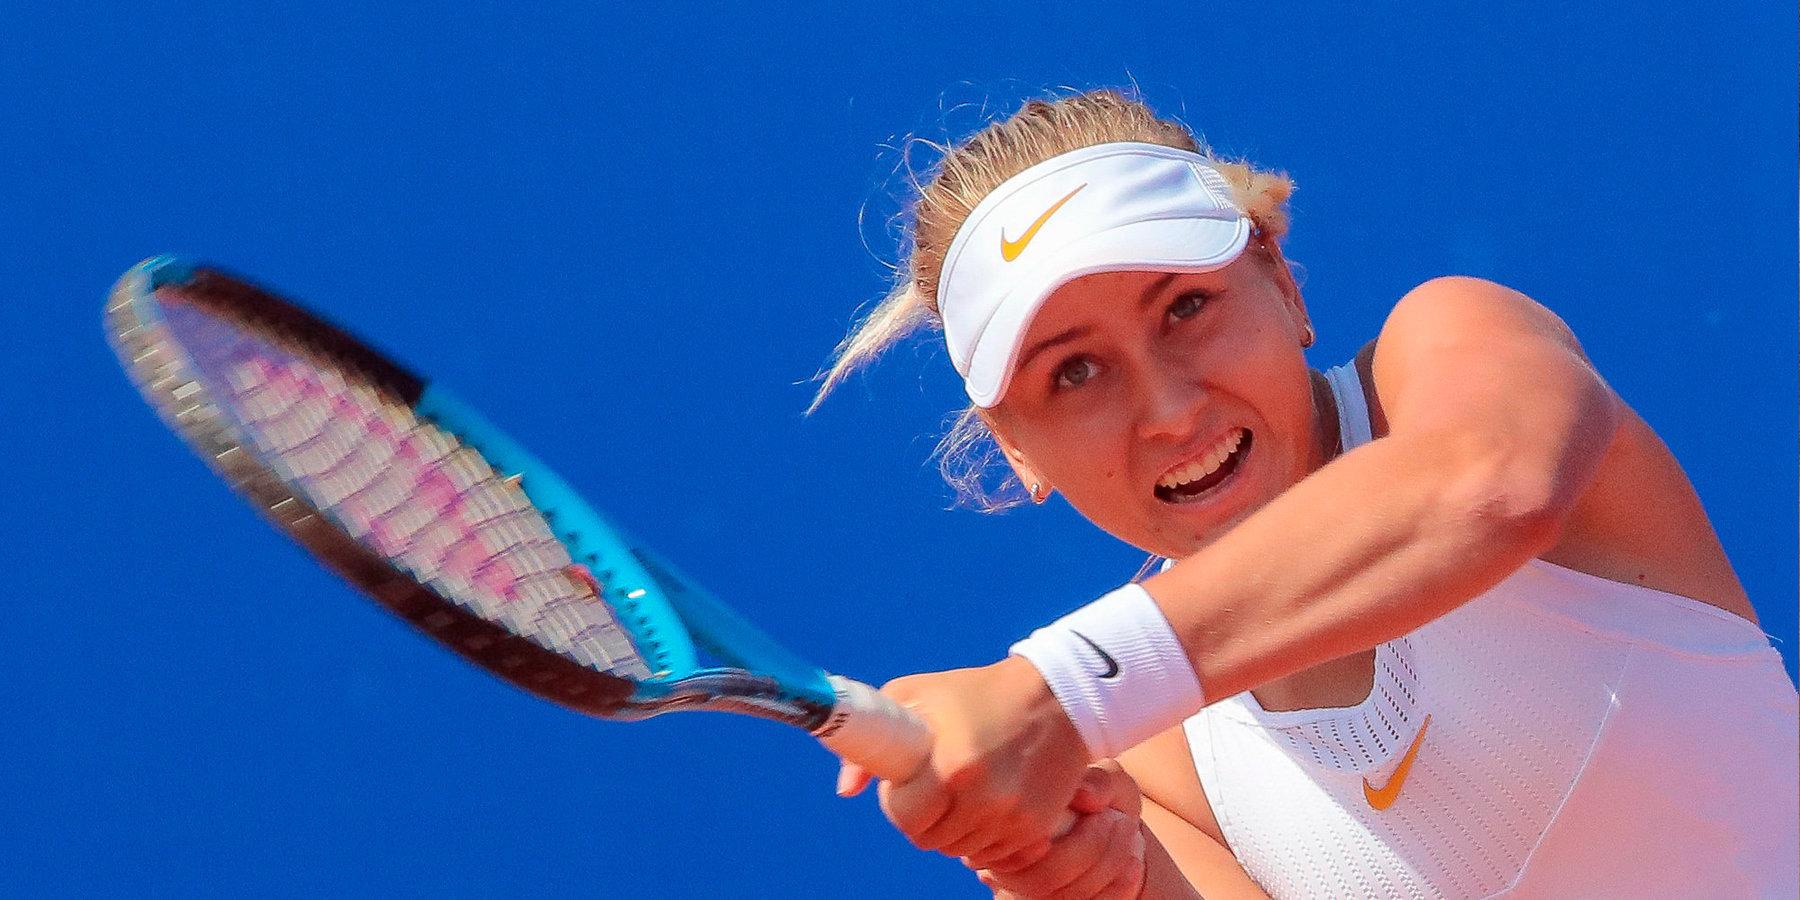 Вондрусова разгромила Потапову во втором круге «Ролан Гаррос»